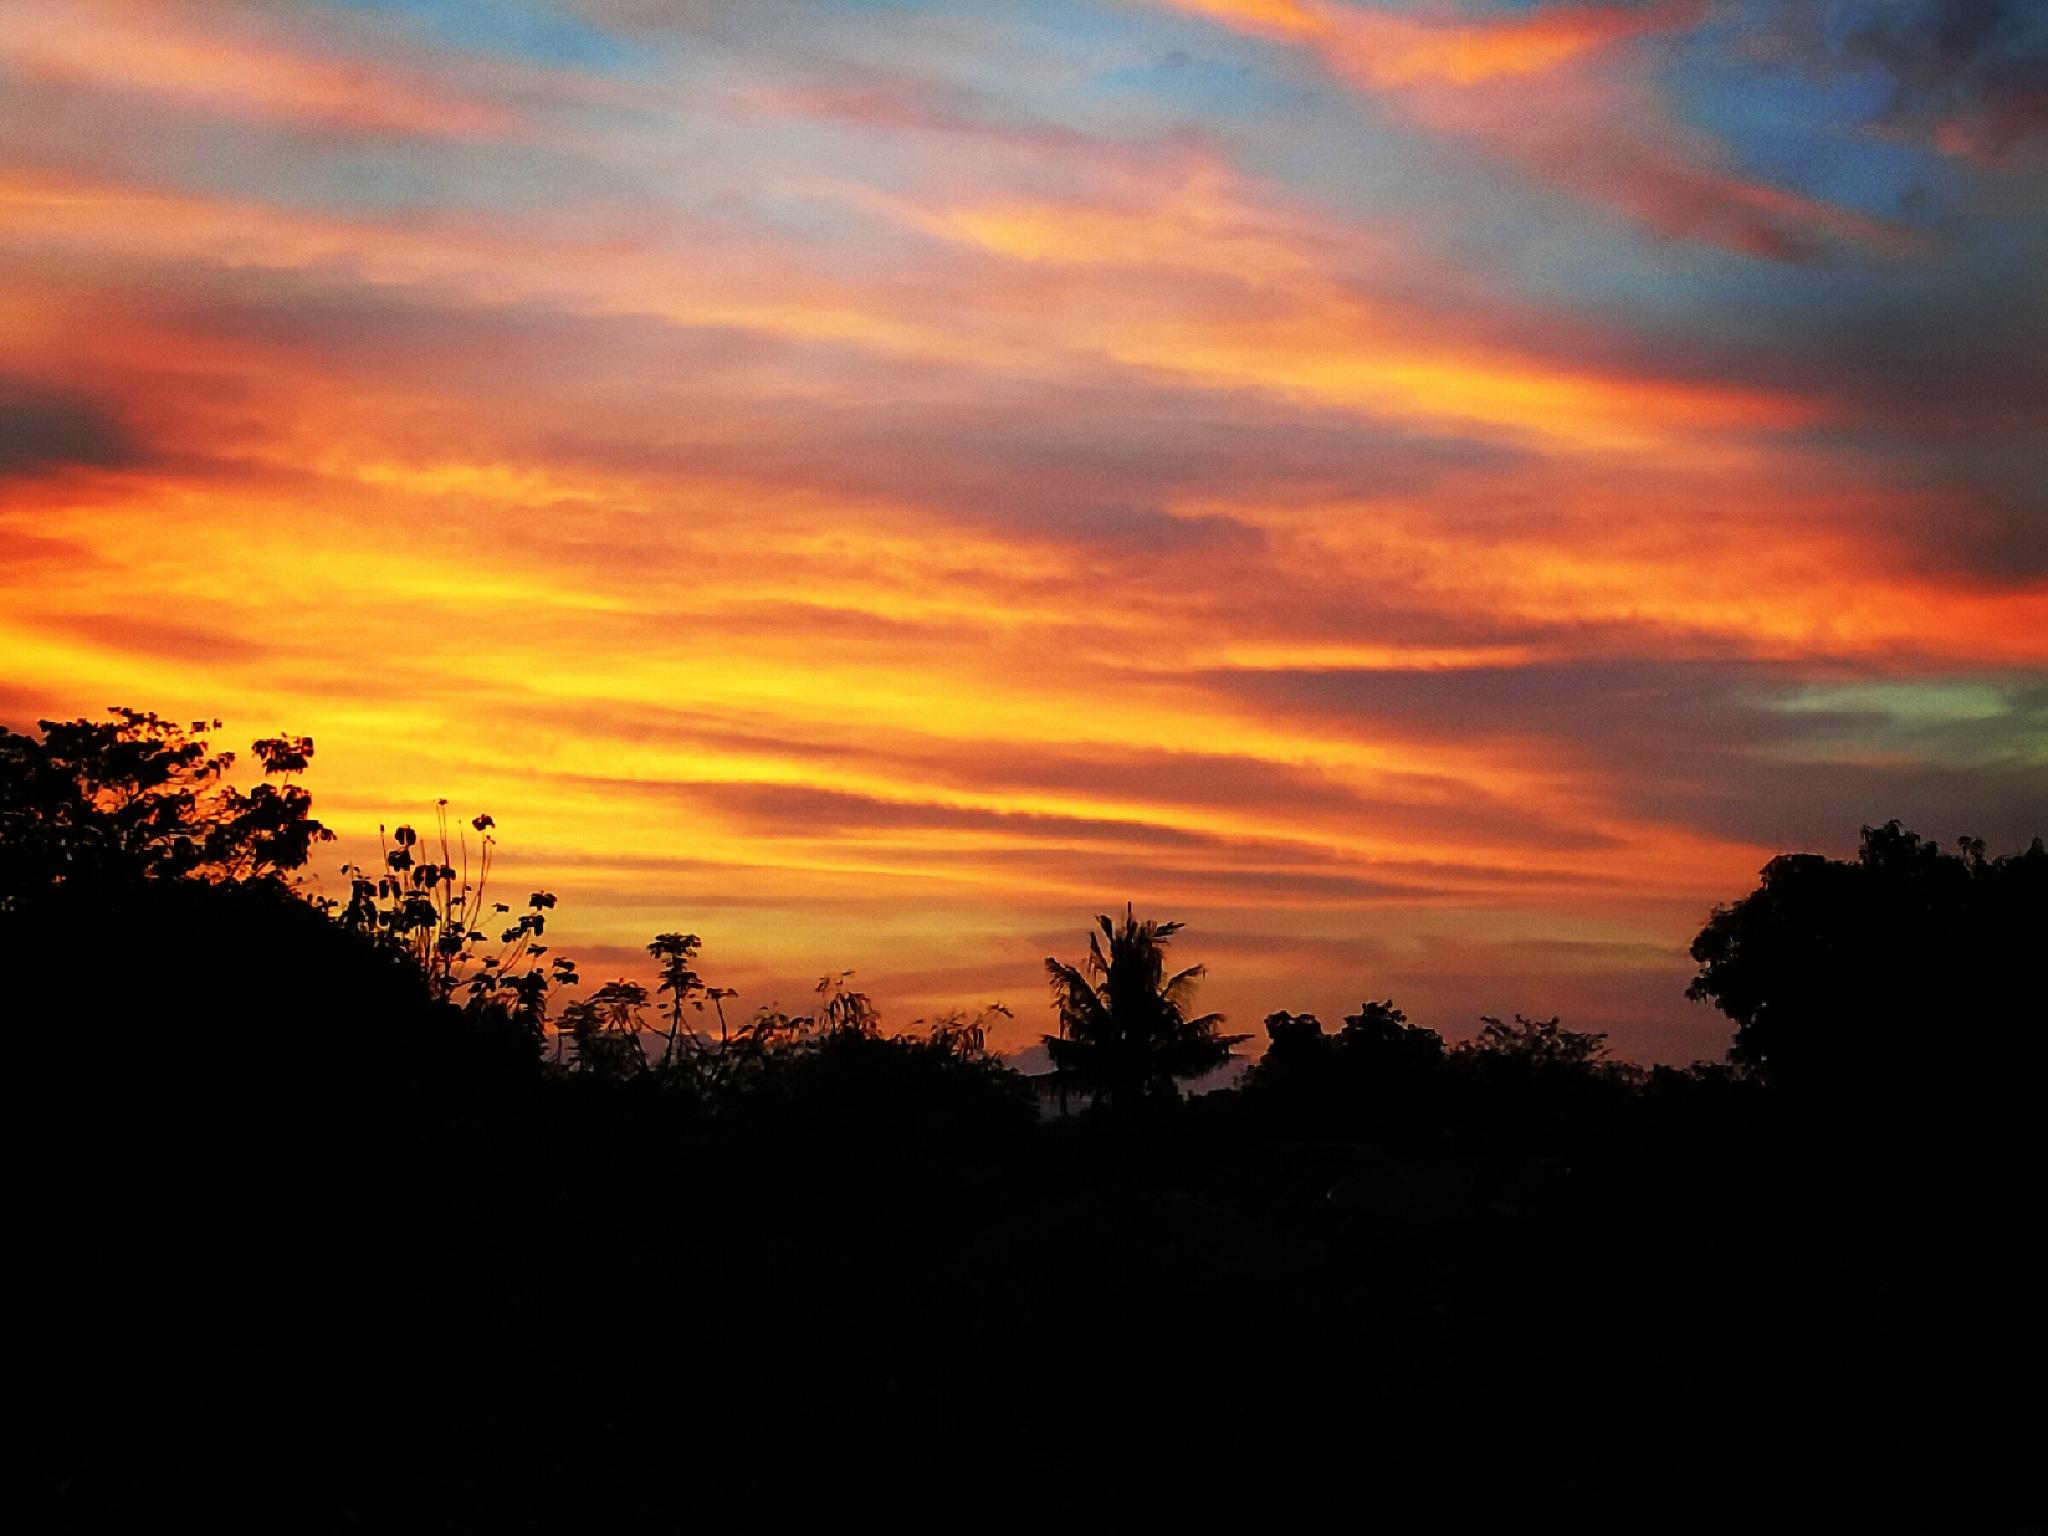 sunset by Novito